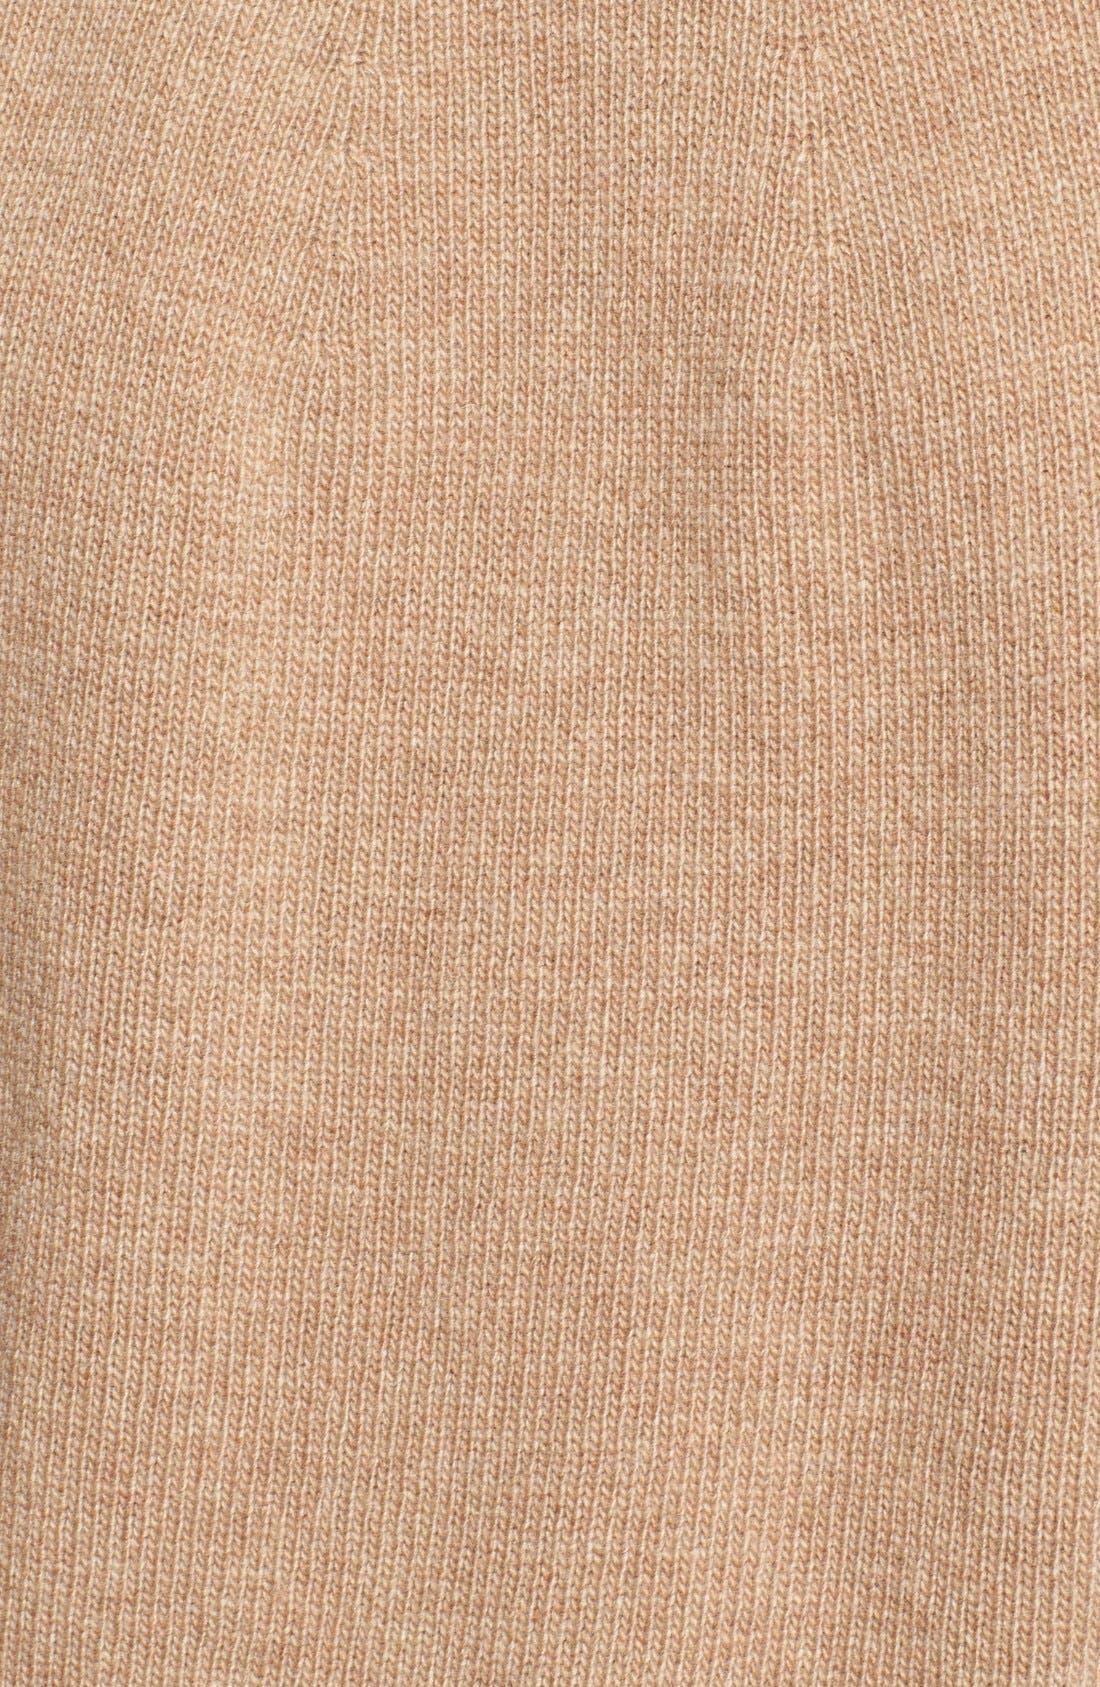 MAX MARA,                             'Anselmo' Wool & Cashmere Sweater,                             Alternate thumbnail 2, color,                             232